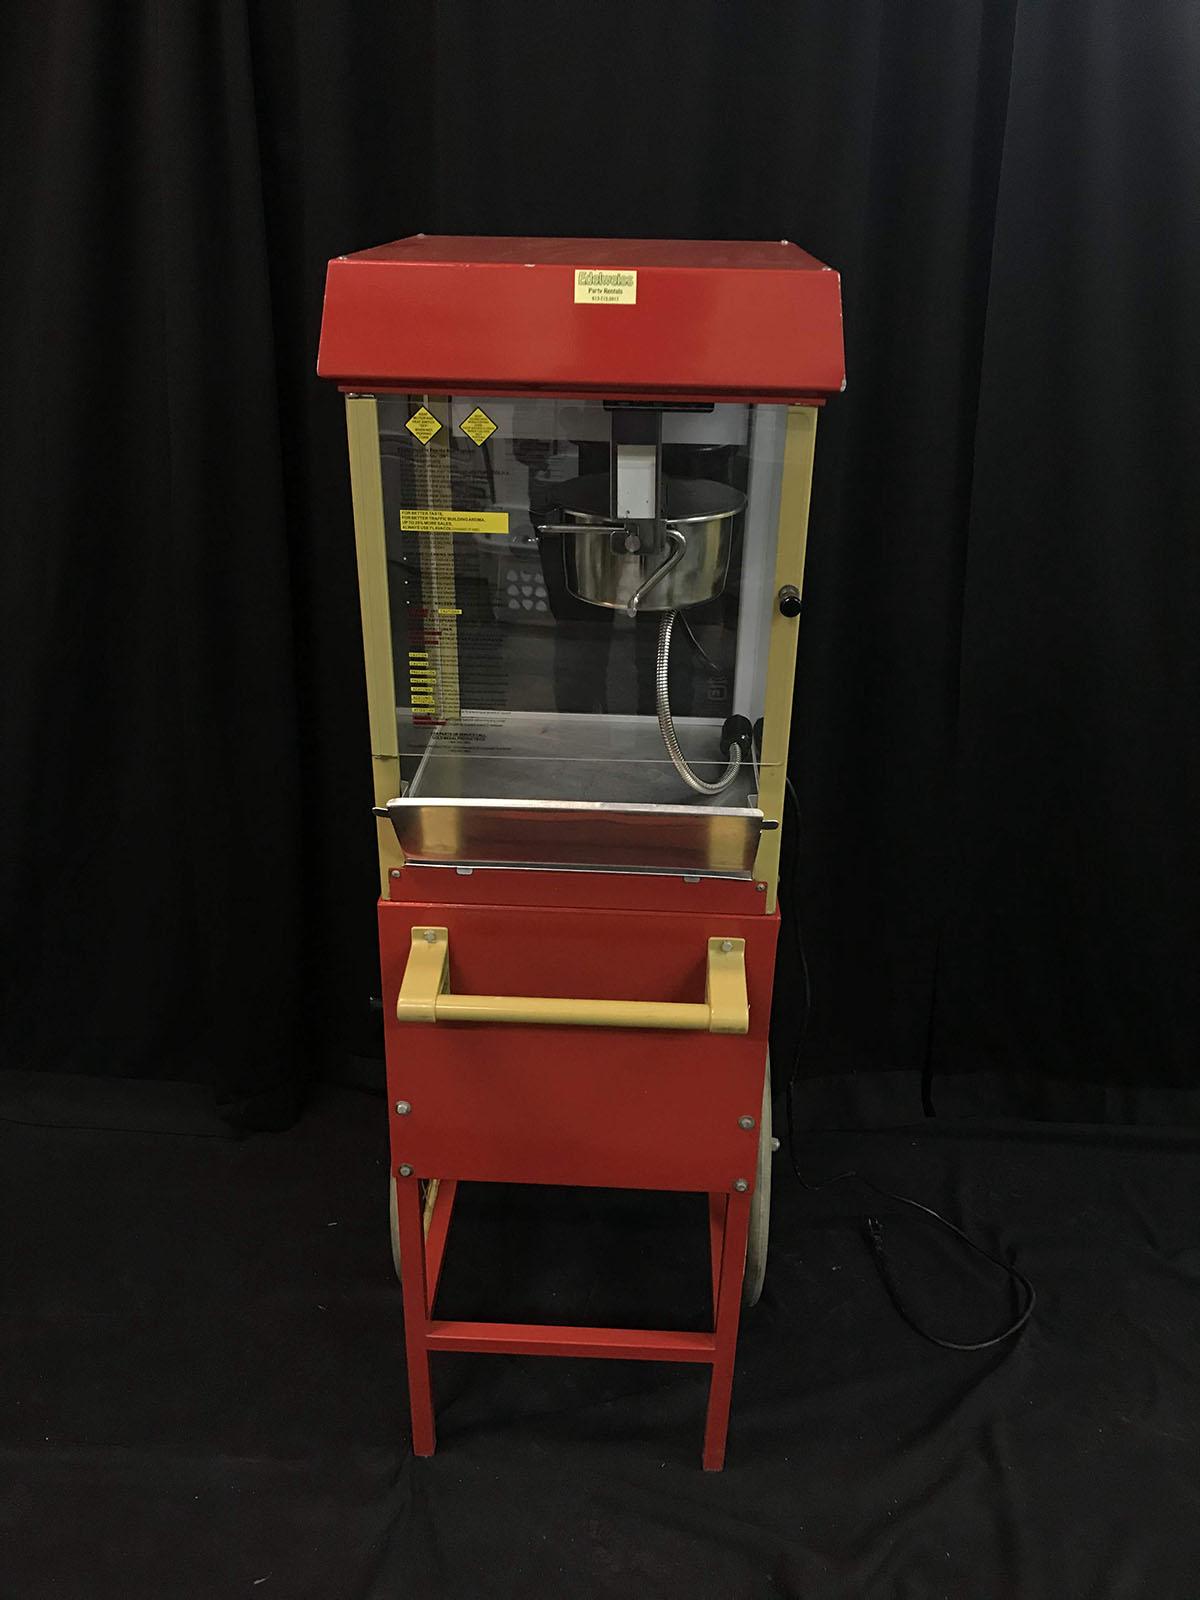 Popcorn machine (on wheels, metal)